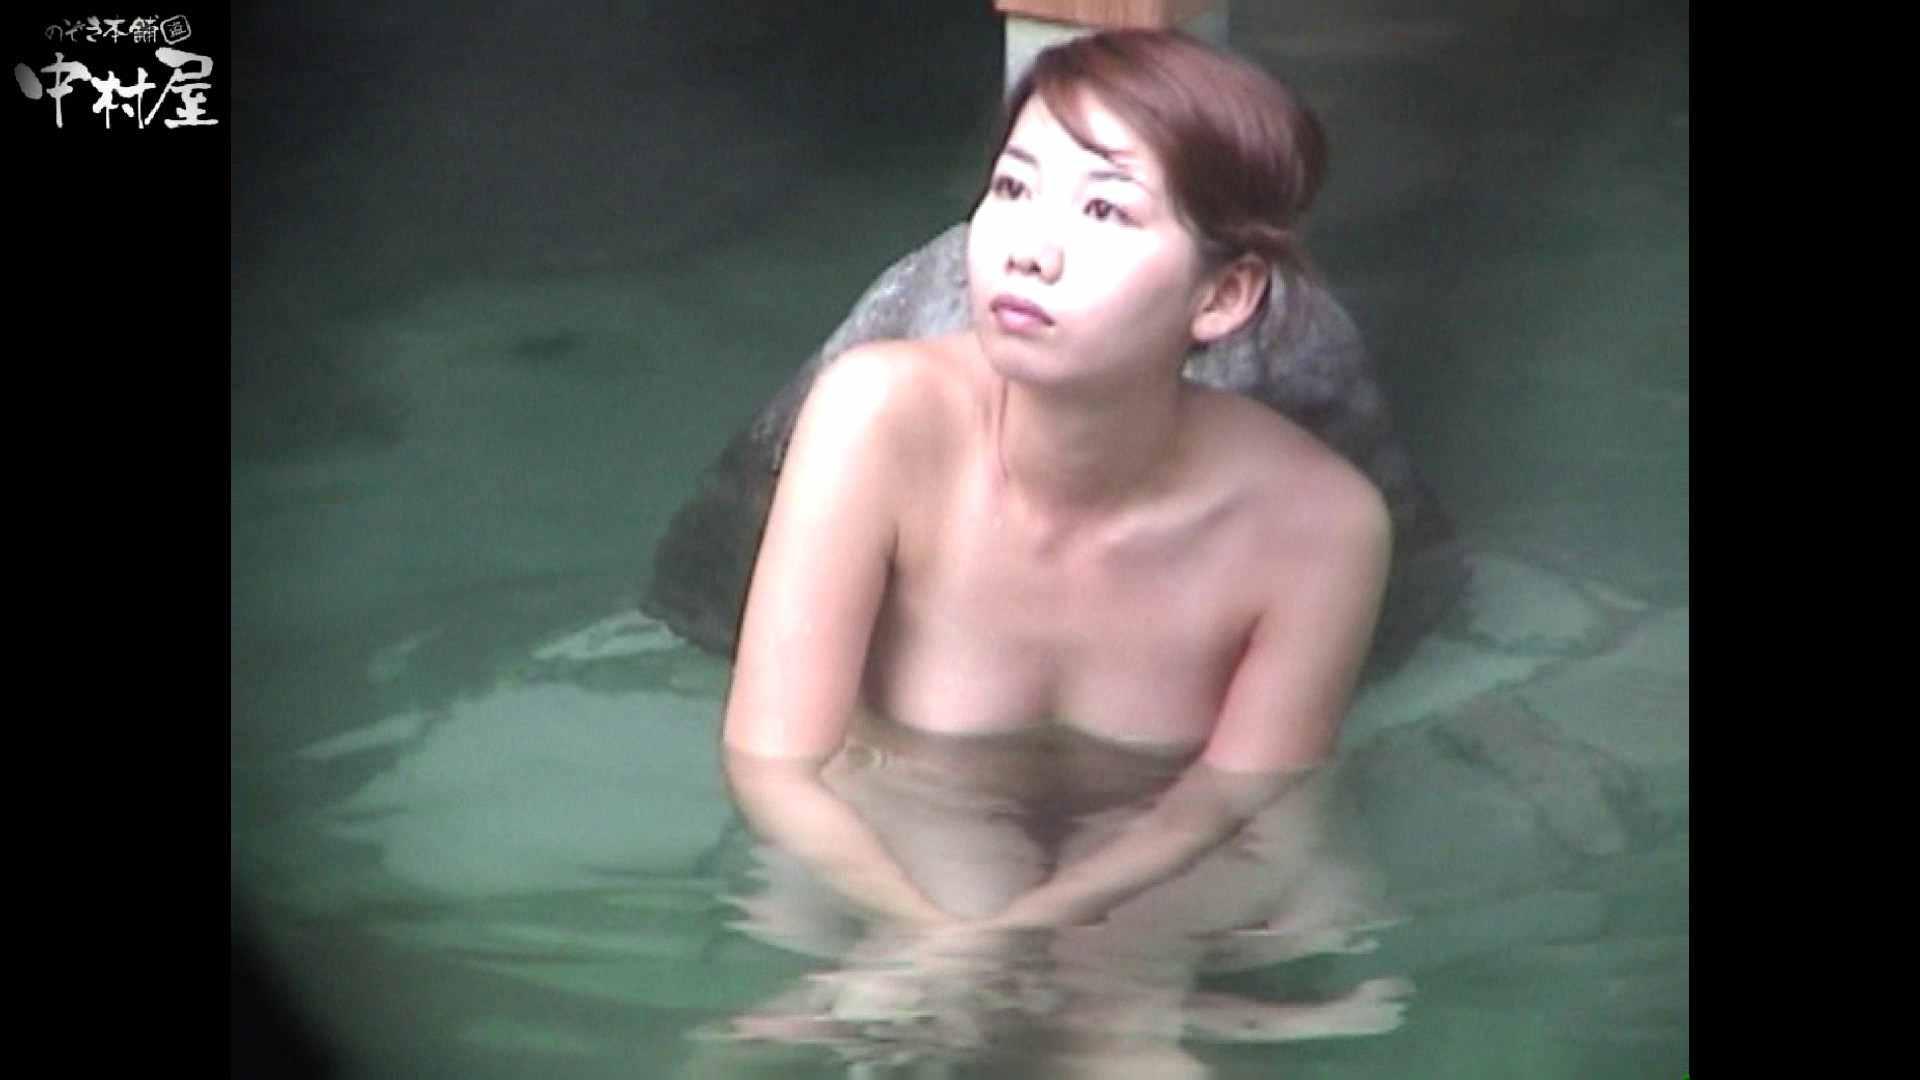 Aquaな露天風呂Vol.951 盗撮師作品 | 露天風呂突入  96pic 88